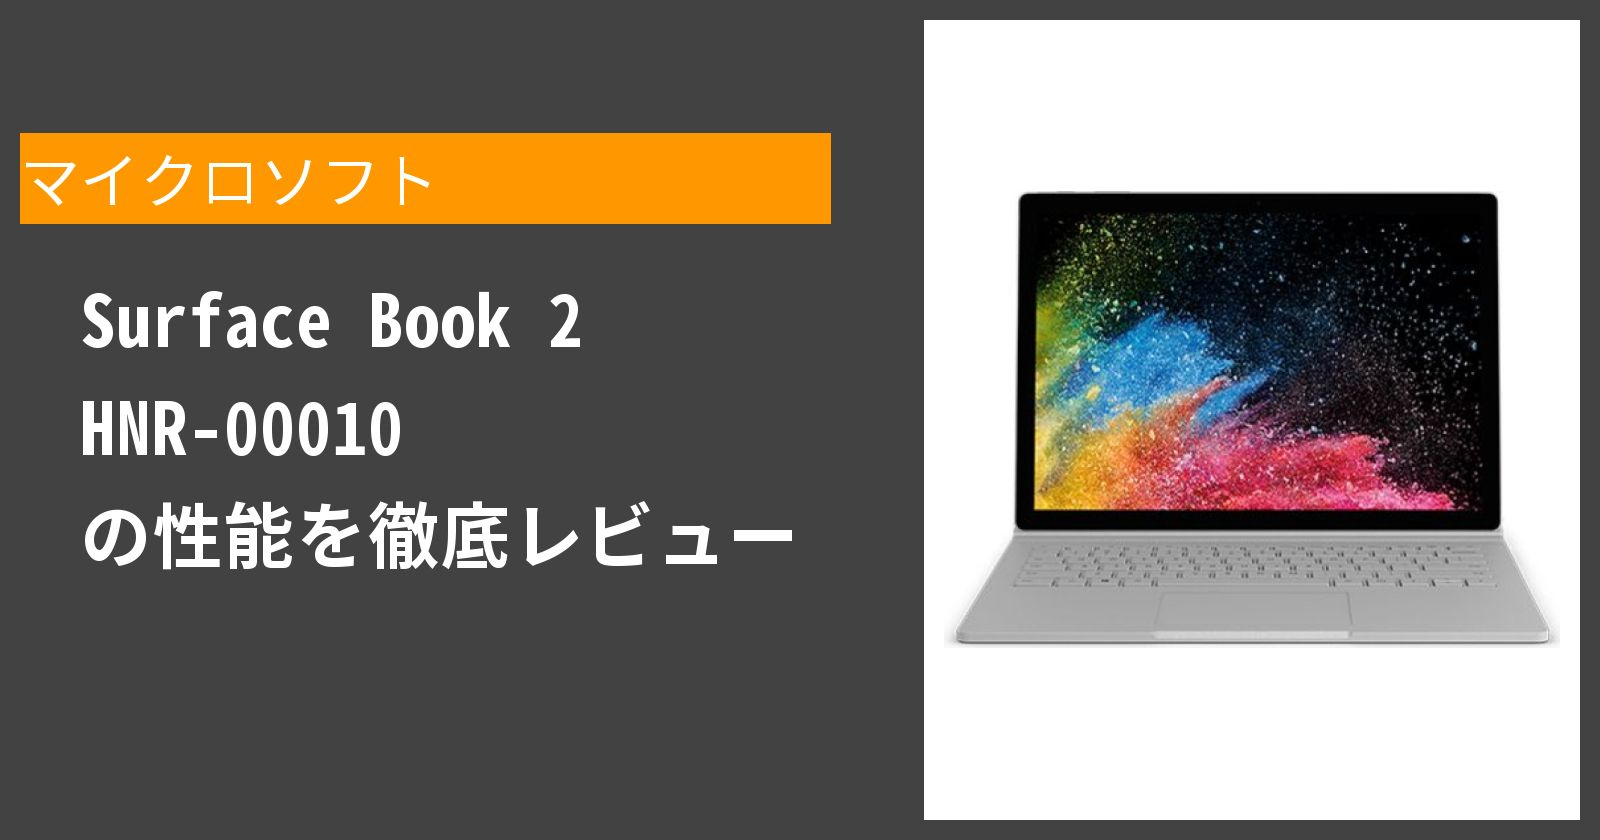 Surface Book 2 HNR-00010 の性能を徹底レビュー